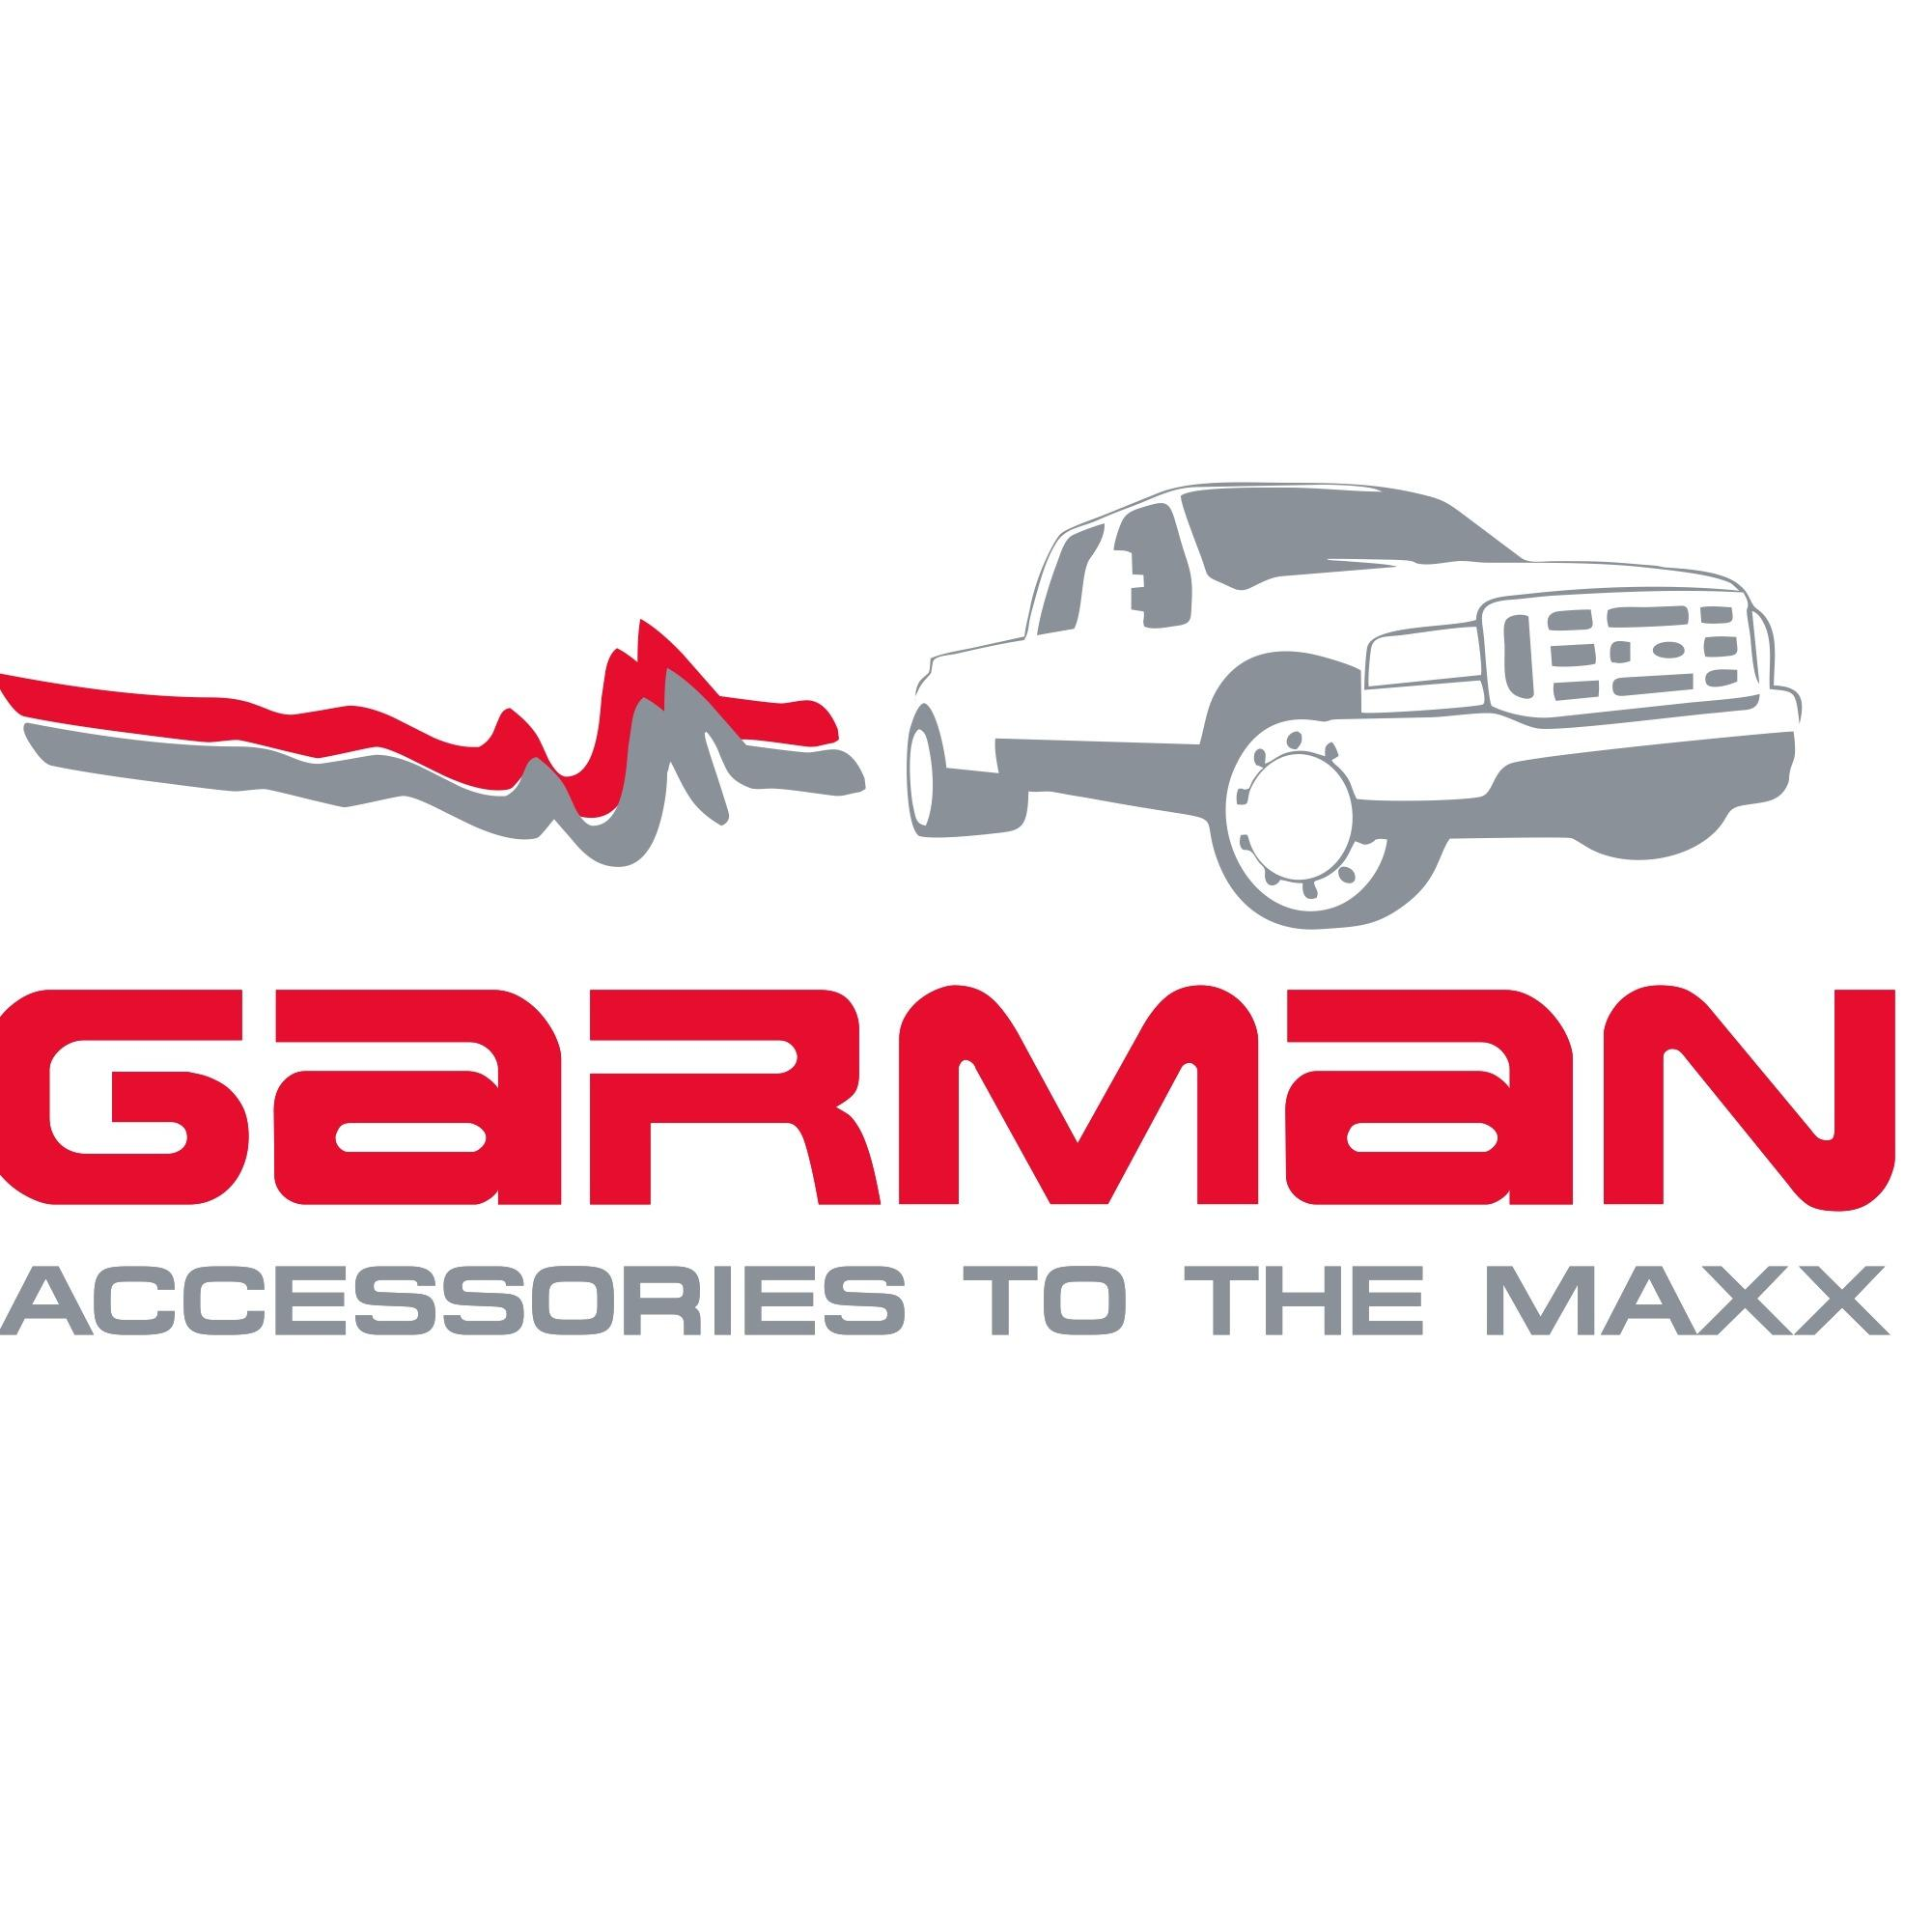 GARMAN ACCESSORIES TO THE MAXX